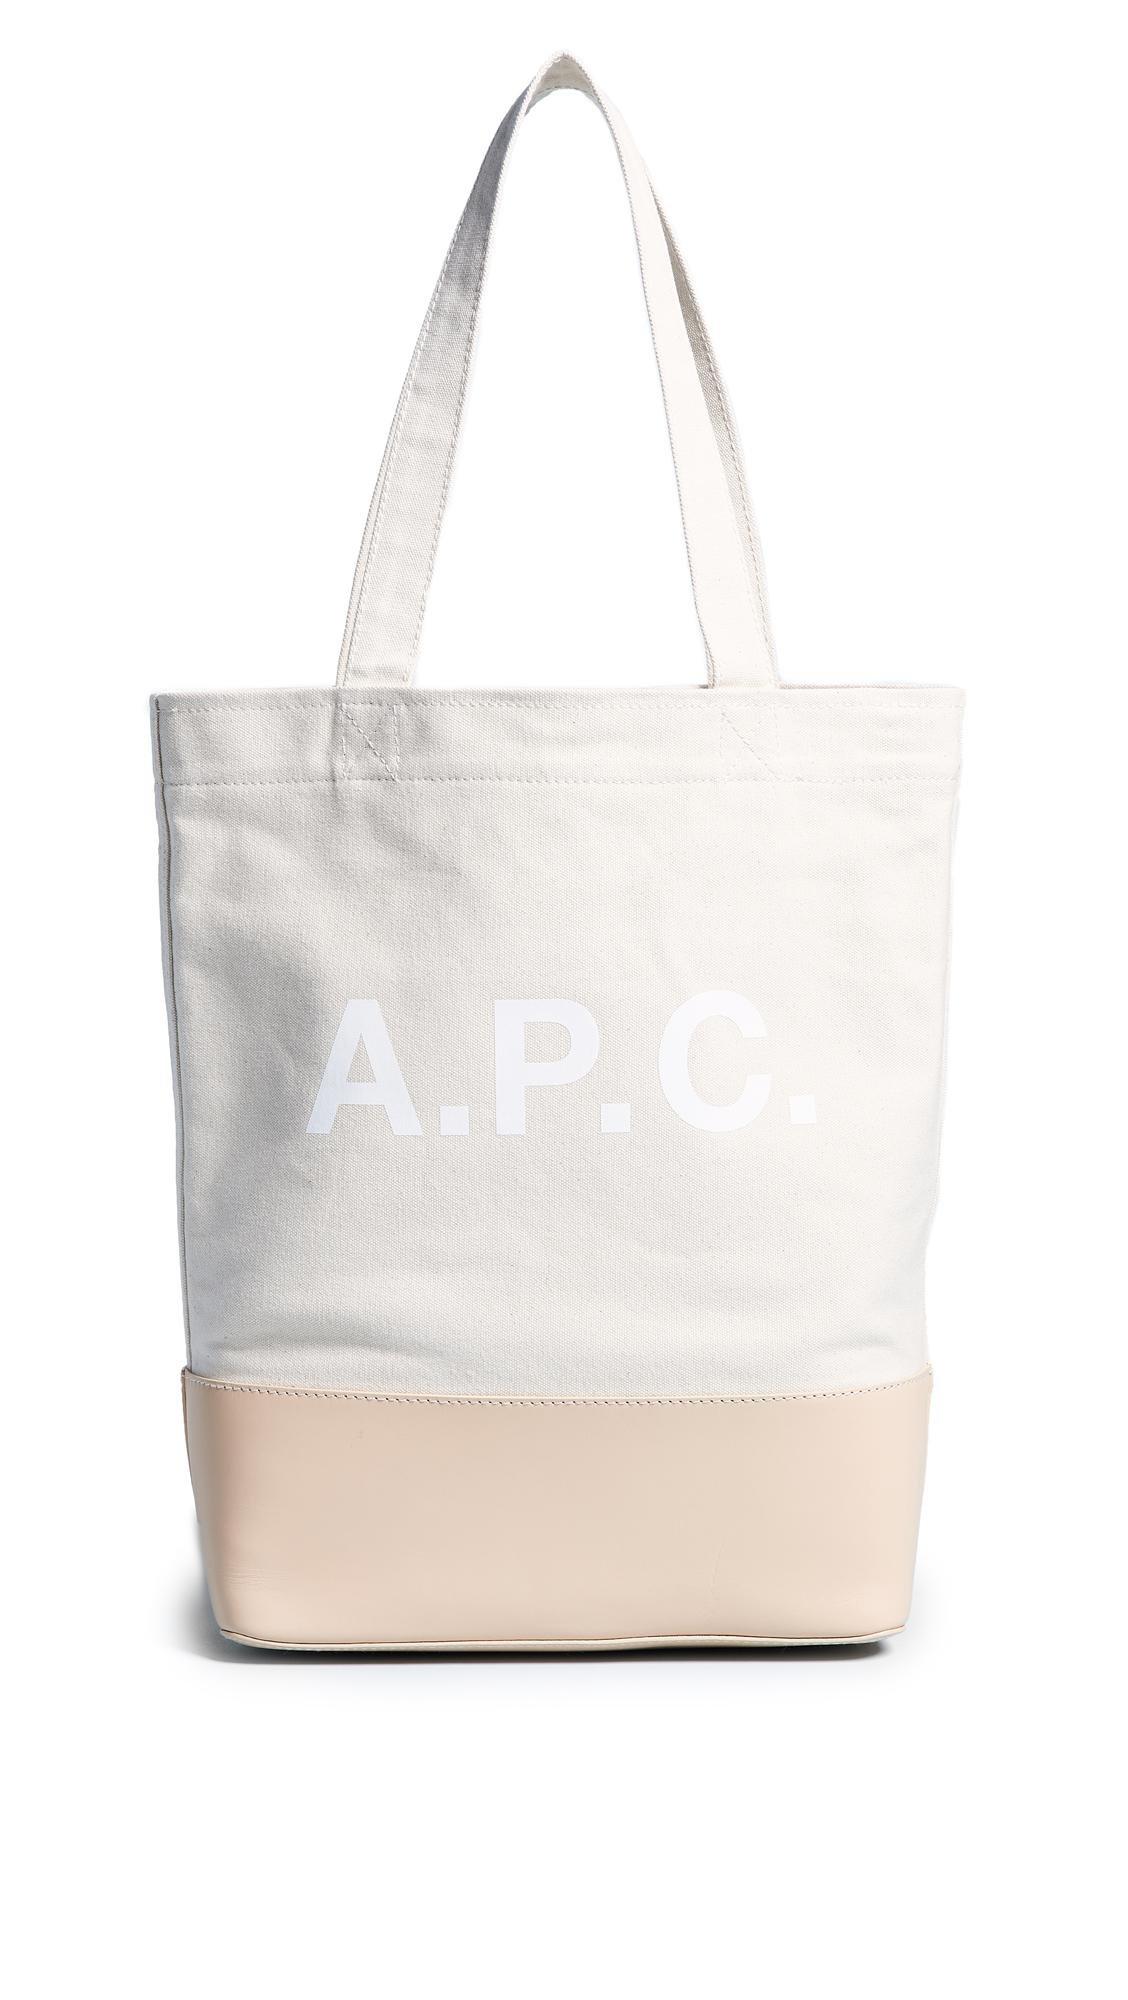 A.P.C. Canvas Cabas Axel Tote in Ecru (White)